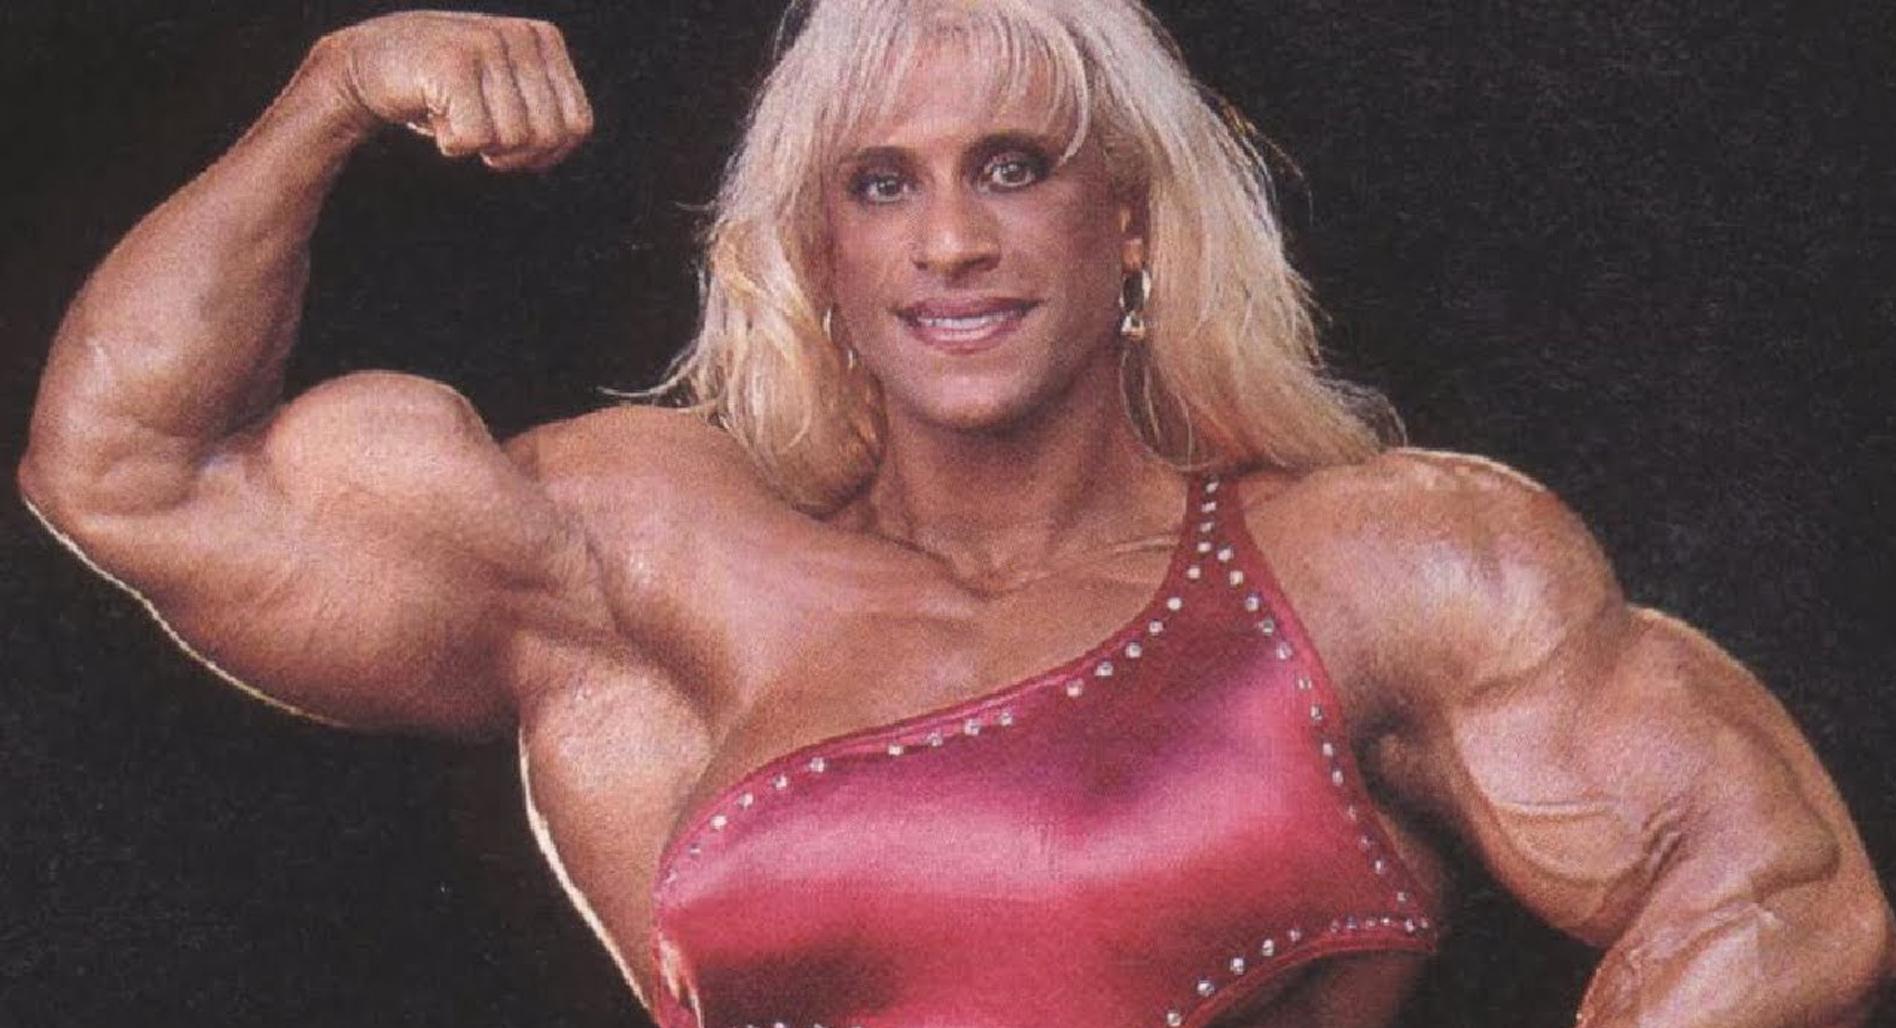 SHOCKING female bodybuilders